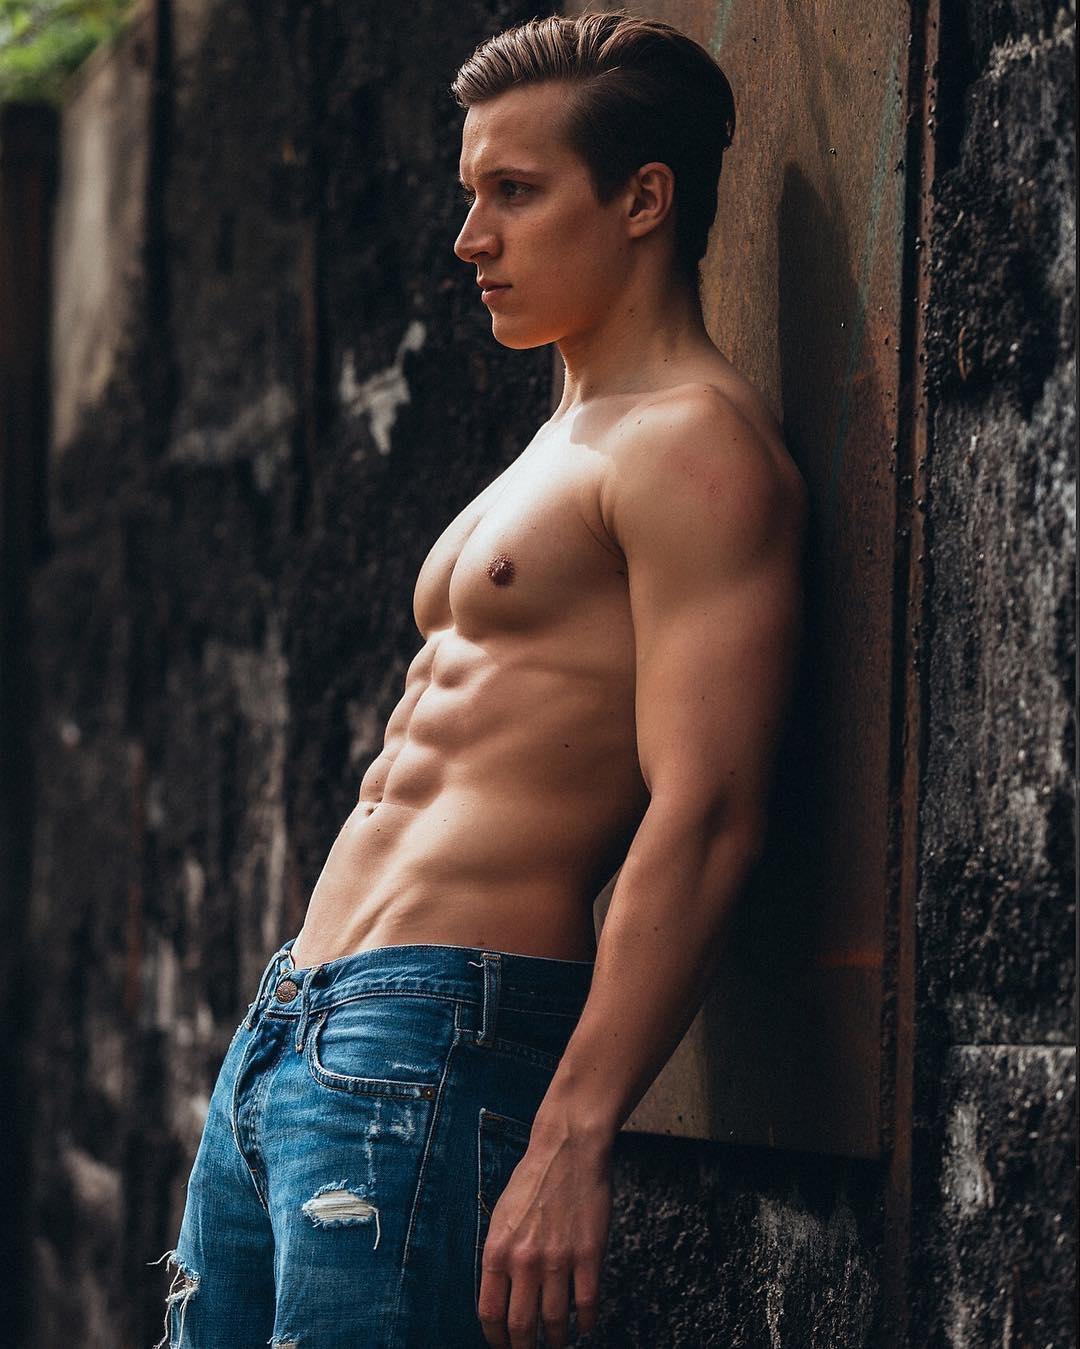 Alex by Chris Wiener